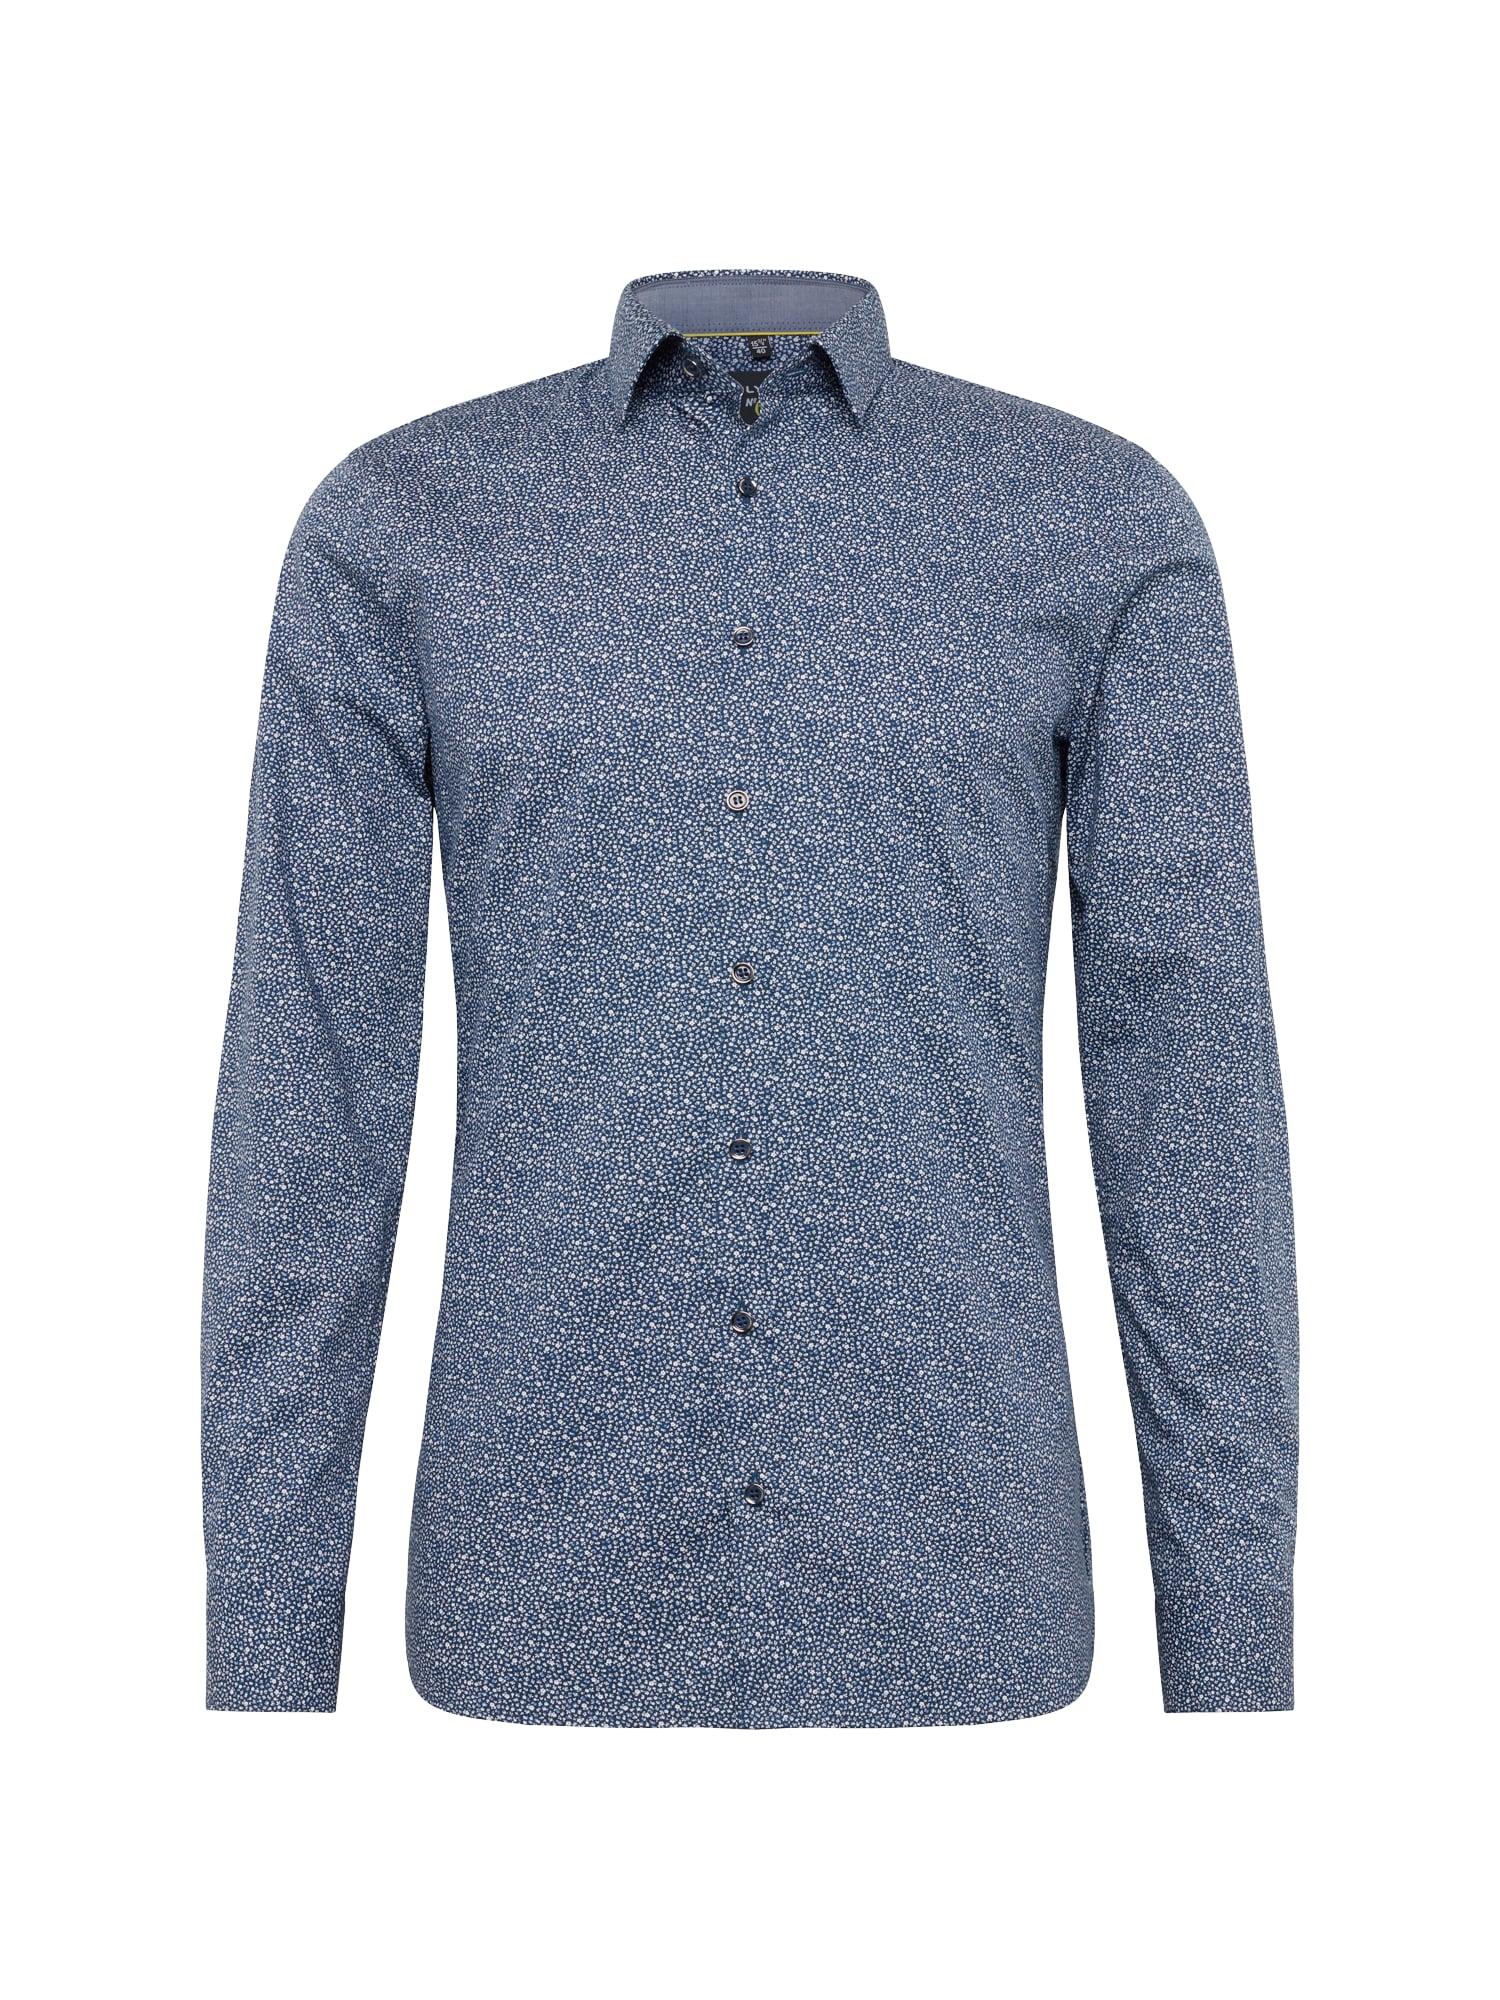 Košile No. 6 Print Floral tmavě modrá bílá OLYMP